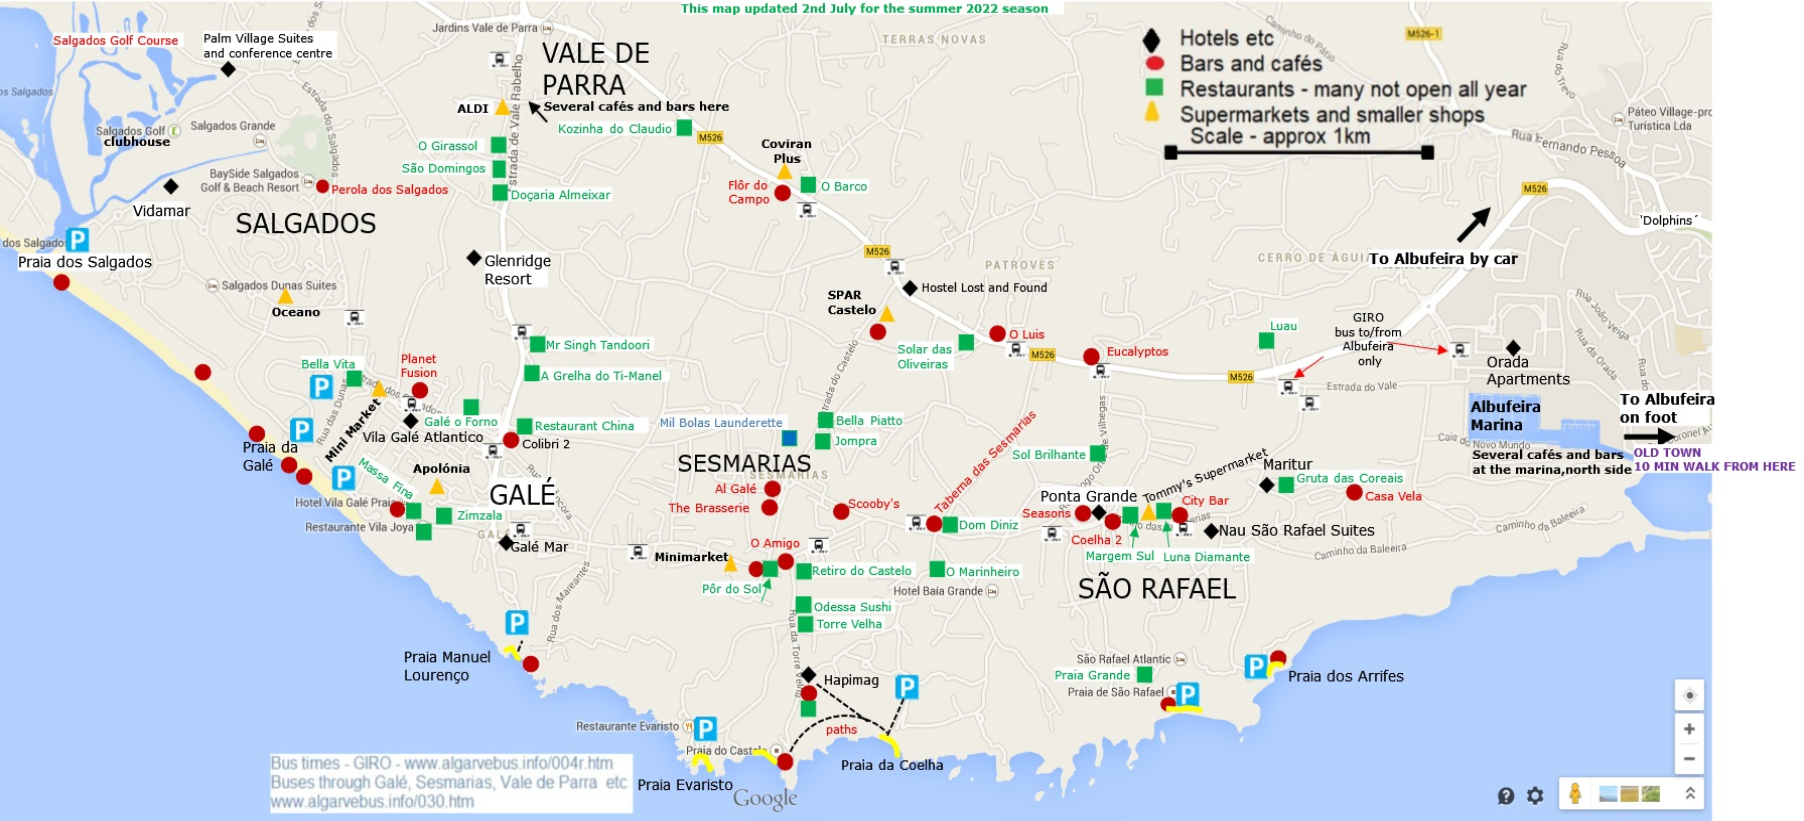 Map of Gal Salgados So Rafael and Sesmarias area of Albufeira